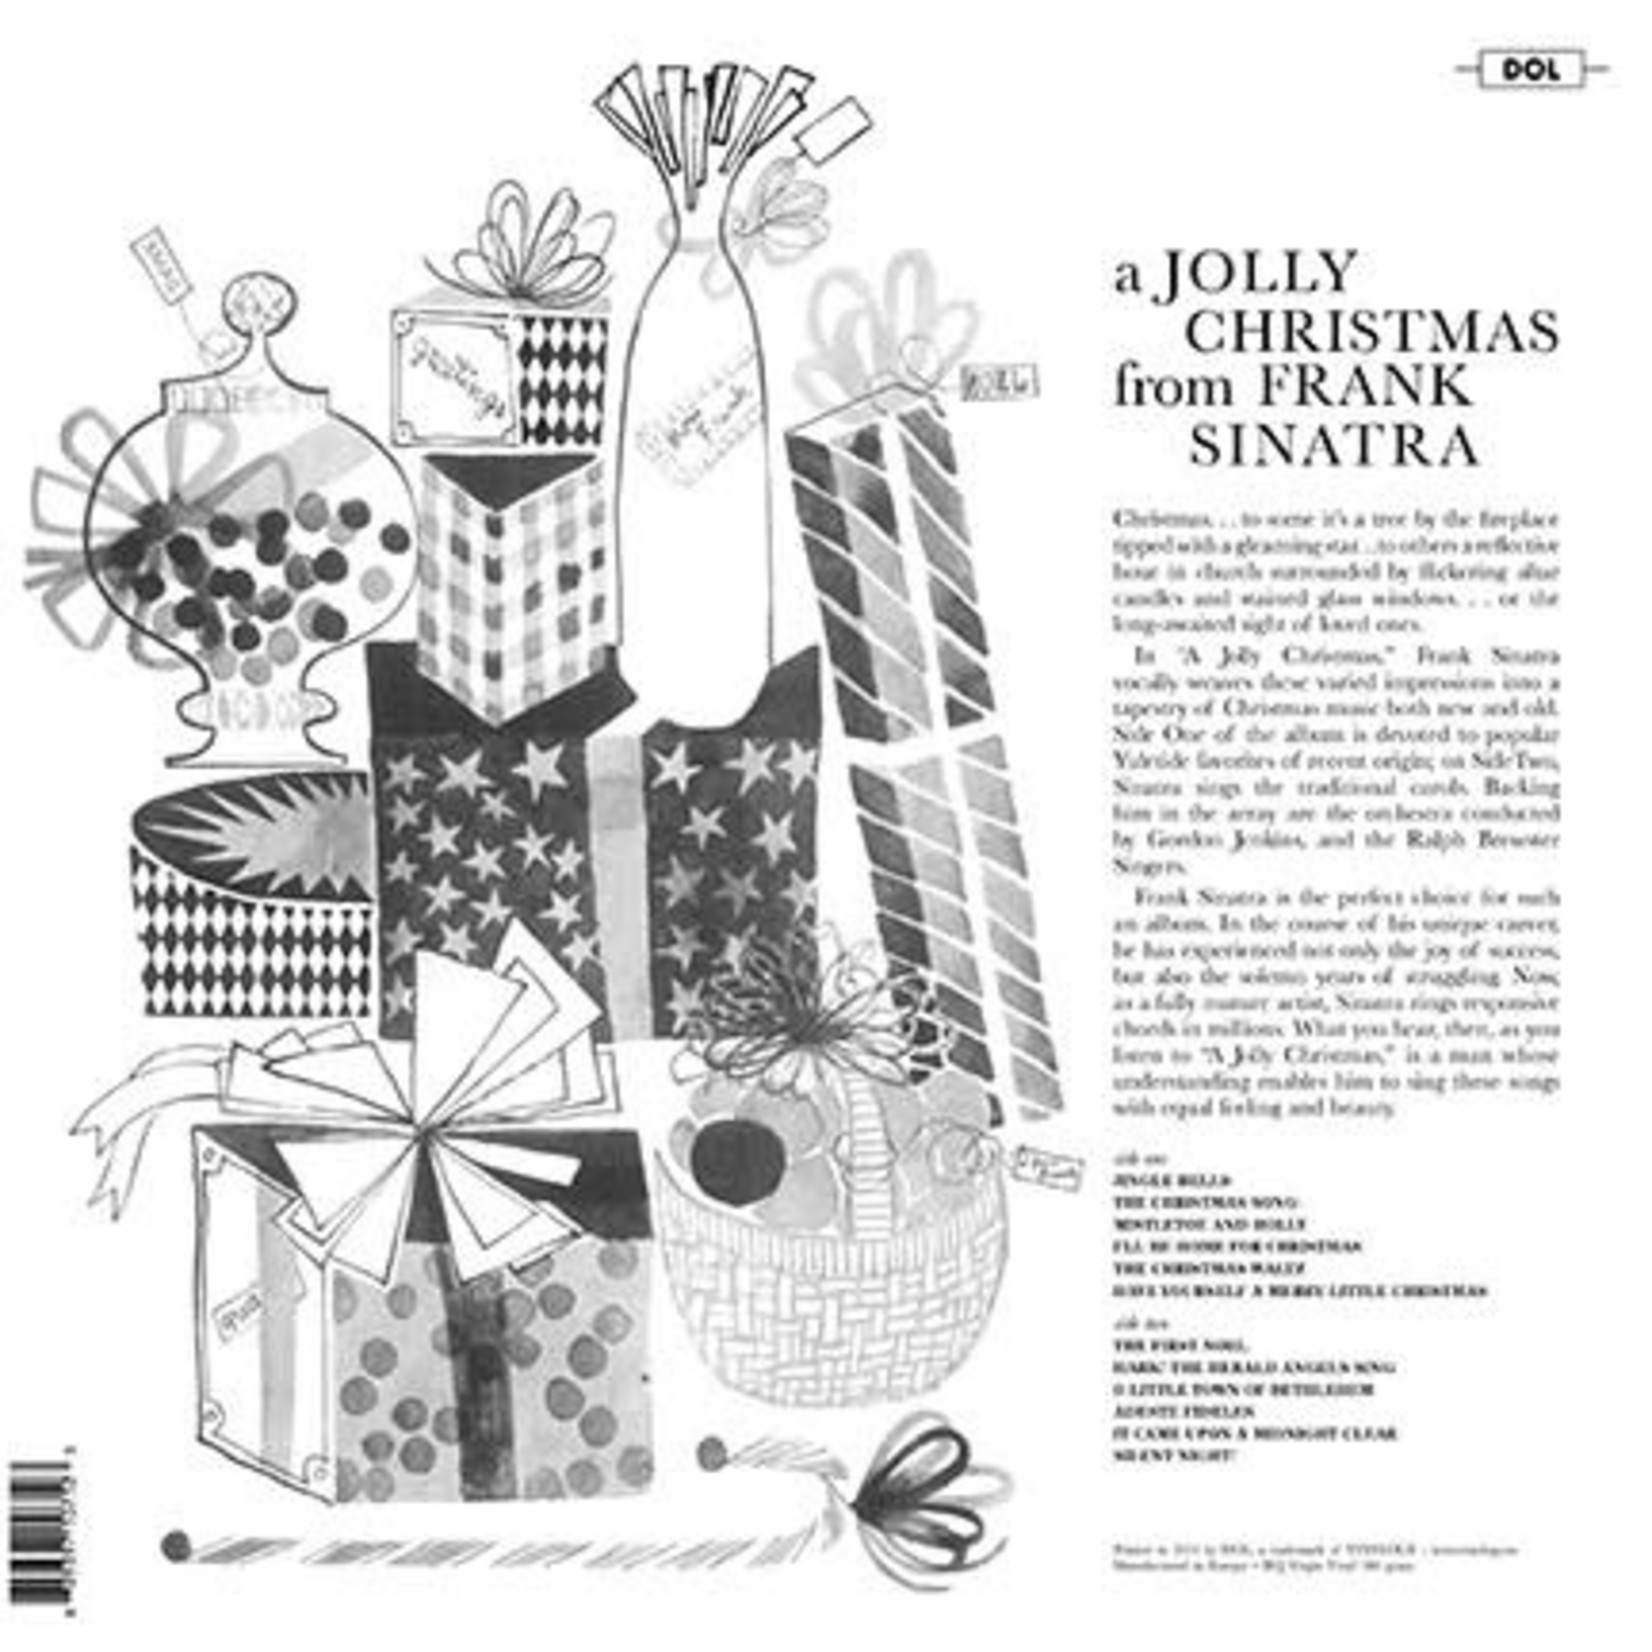 FRANK SINATRA A JOLLY CHRISTMAS FROM FRANK SINATRA (GREEN VINYL)